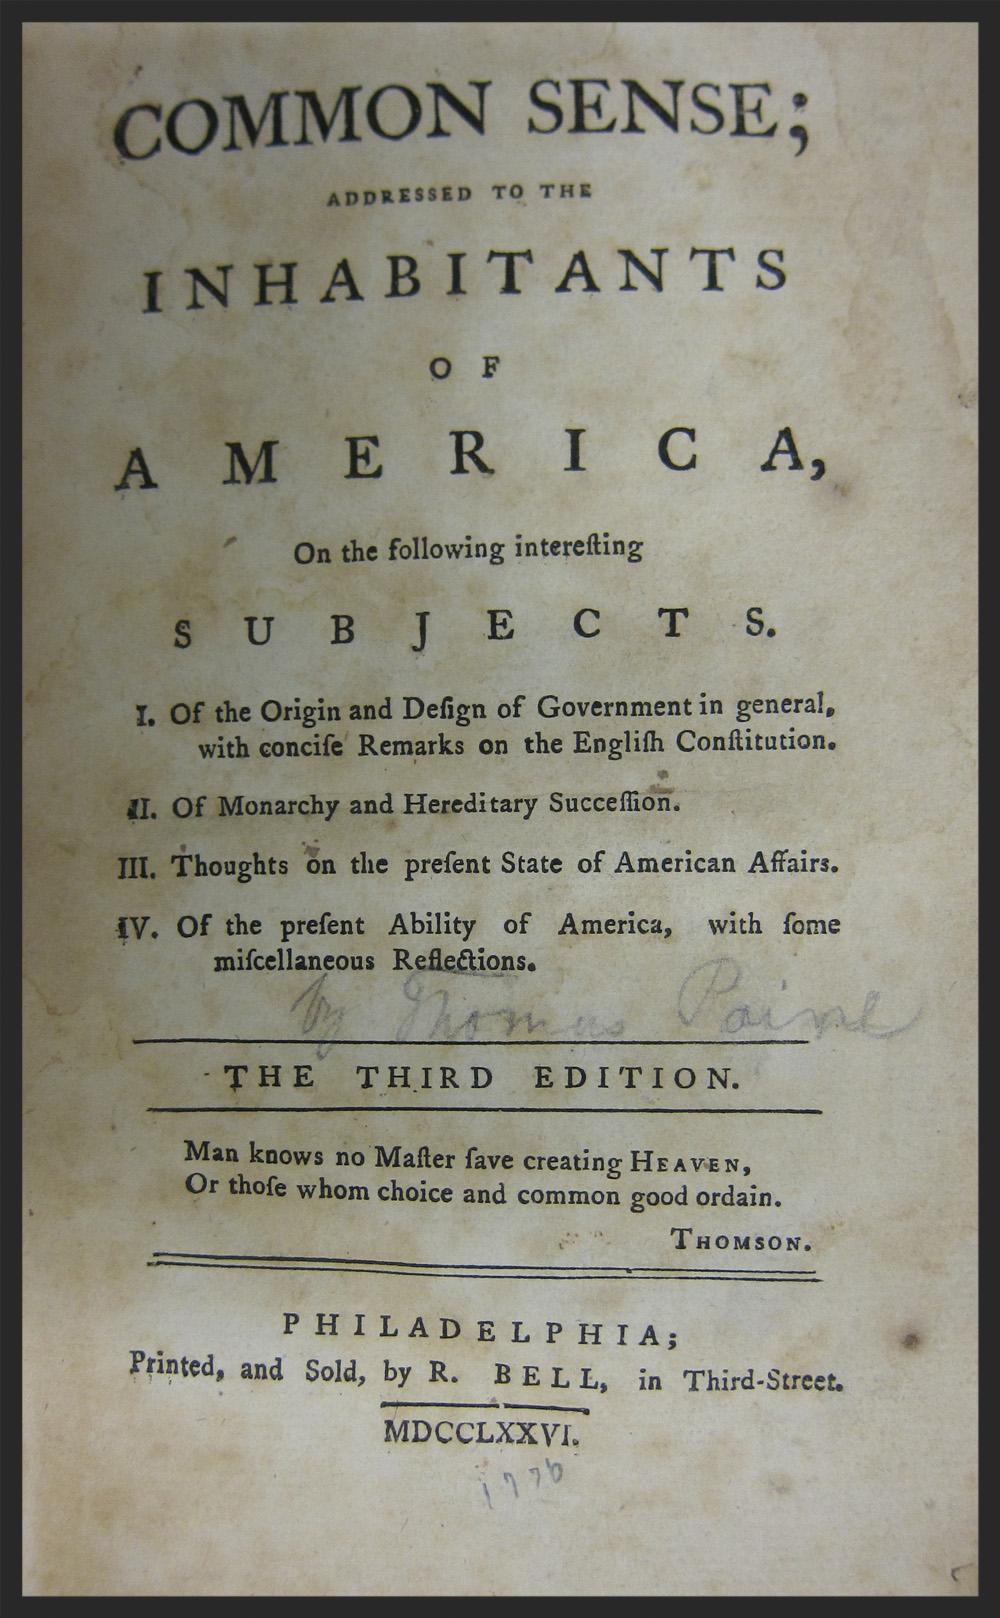 An original copy of Thomas Paine's Common Sense.